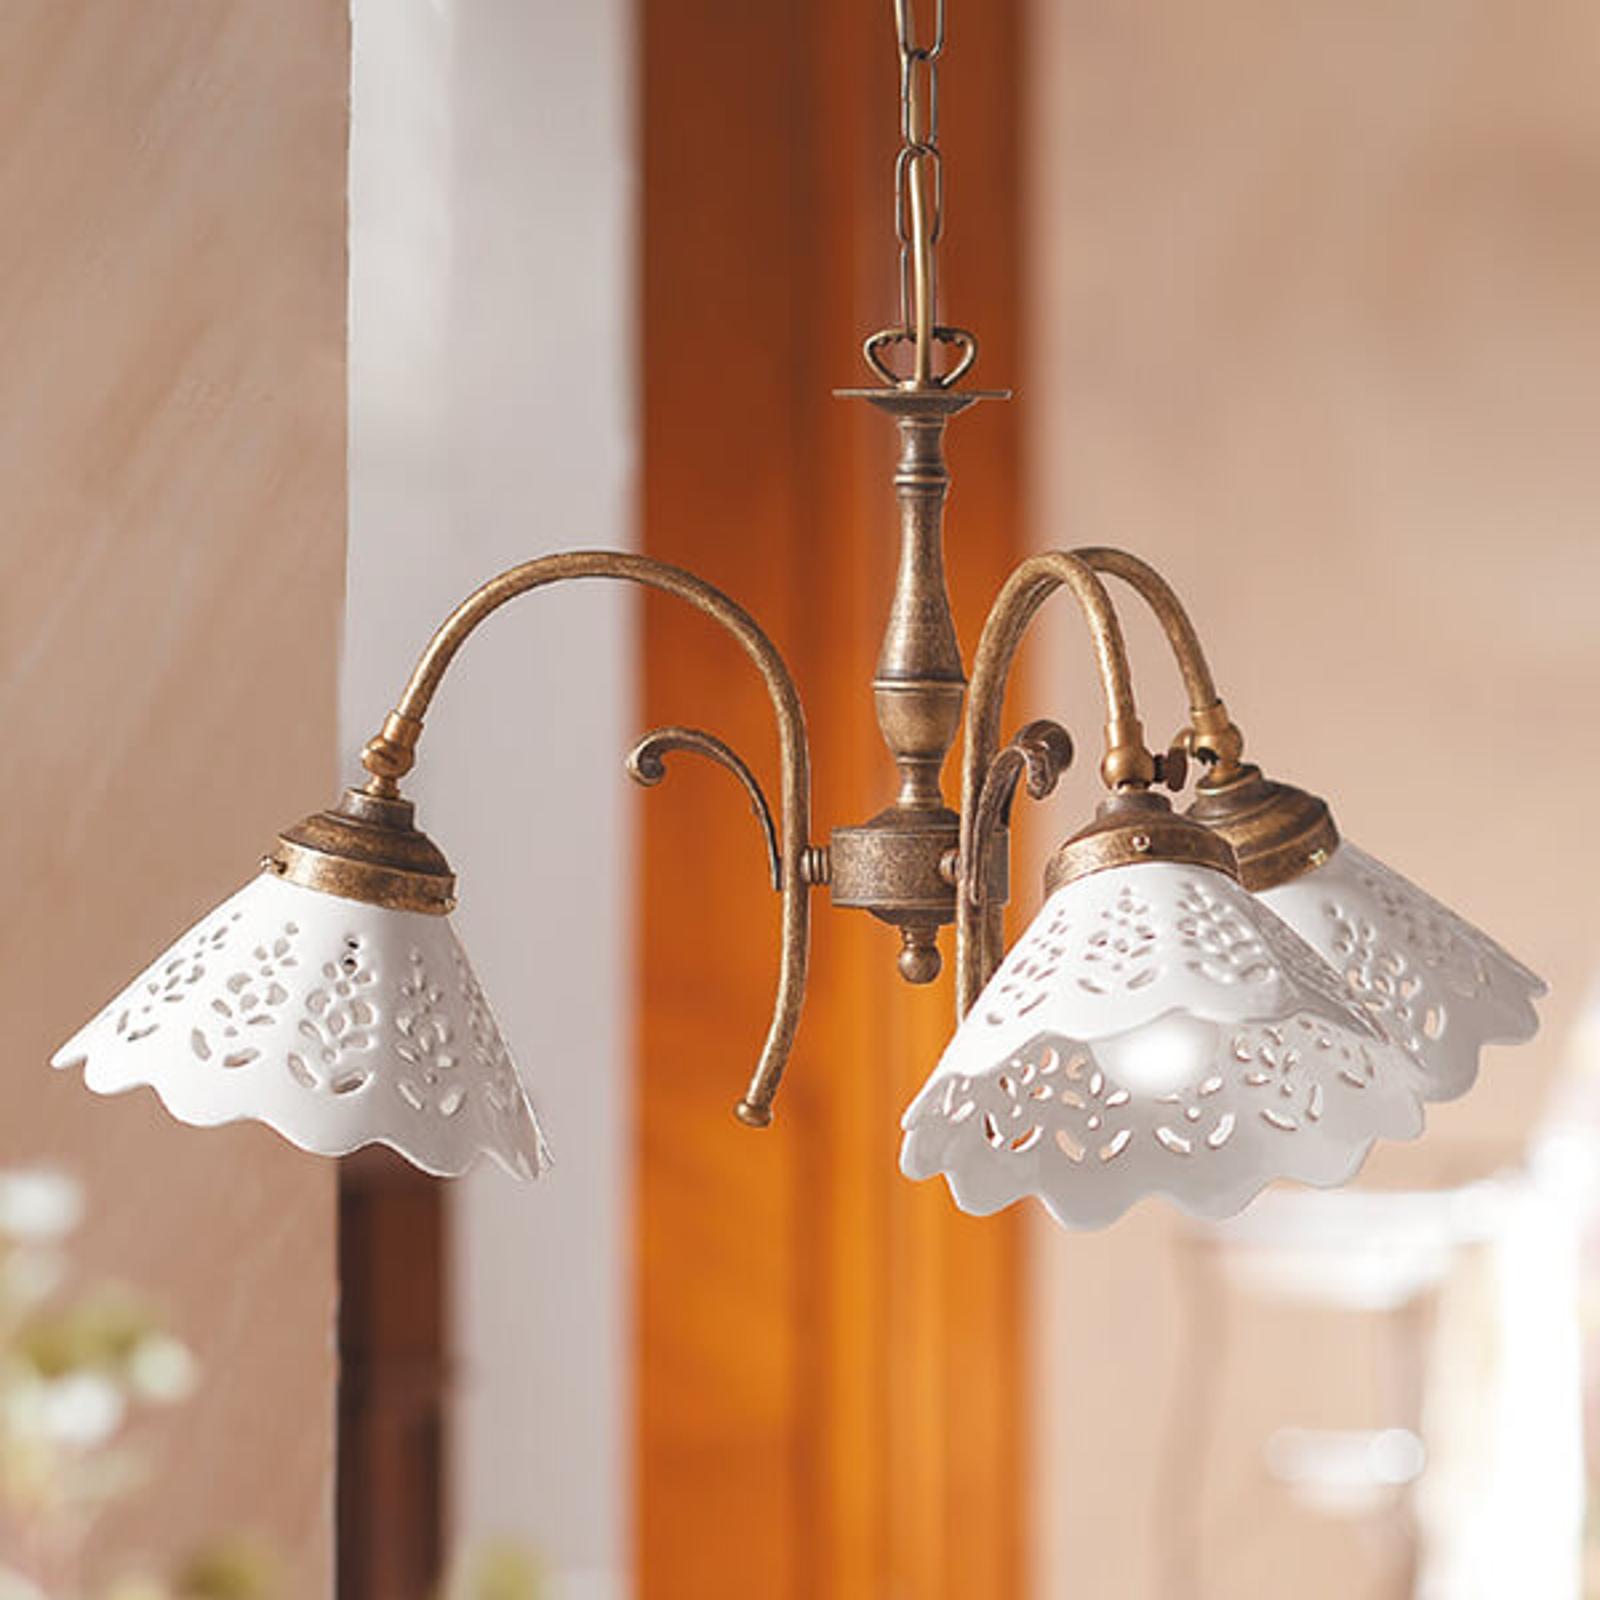 3-punktowa ceramiczna lampa wisząca Semino